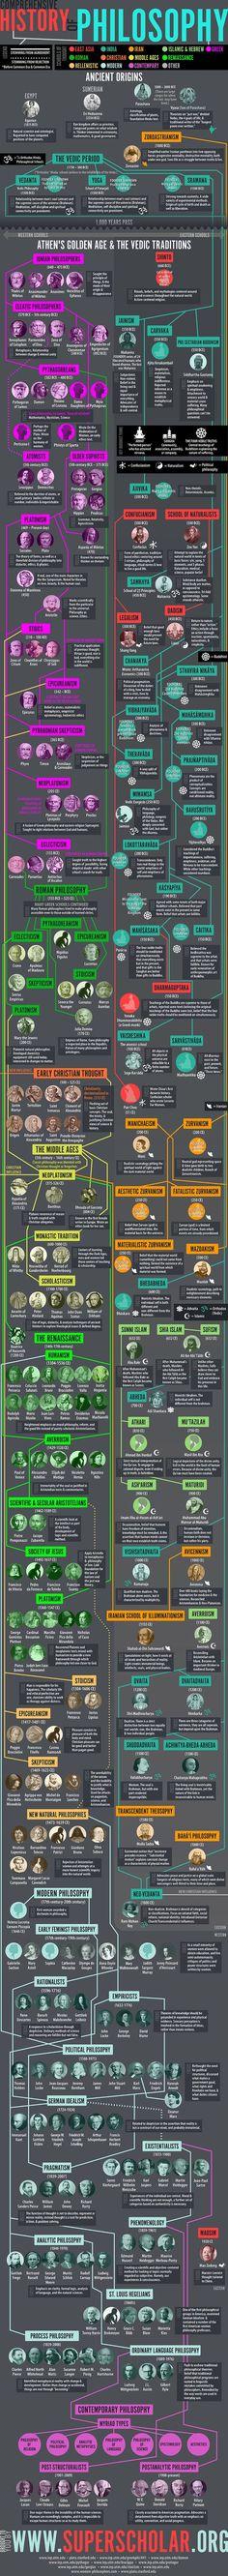 Comprehensive History of Philosophy900: